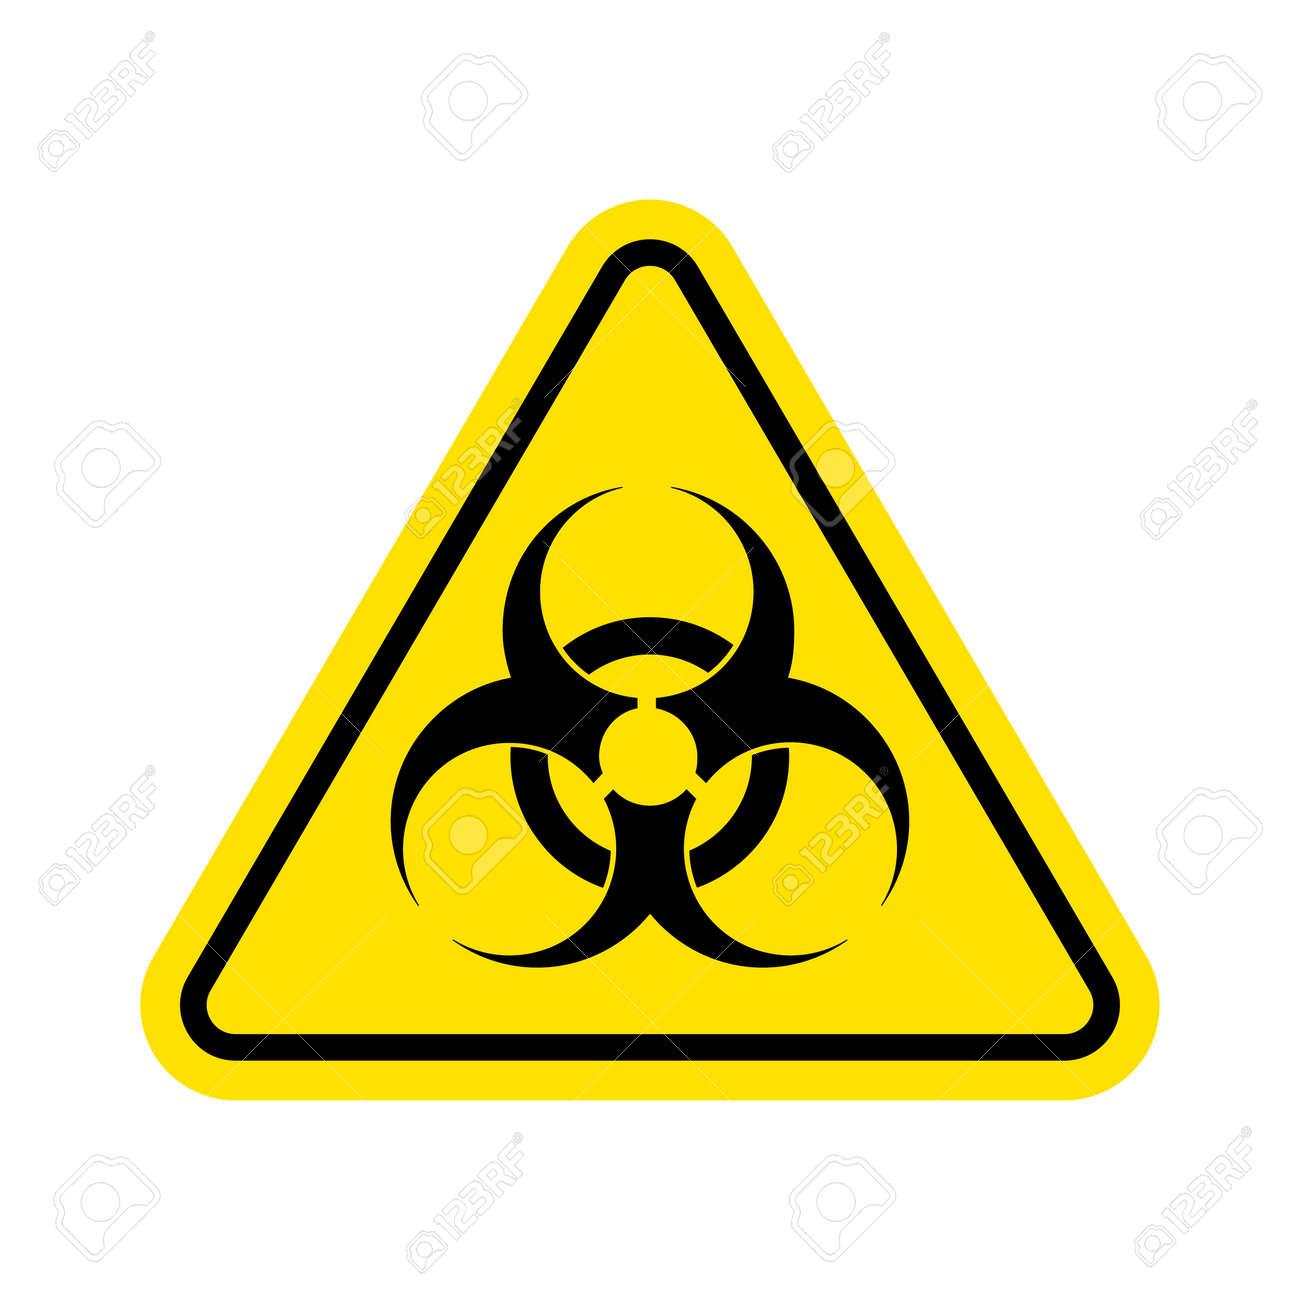 Warning sign of virus. Biohazard icon. Biohazard symbol. isolated on white background. Vector illustration. Eps 10. - 87339892